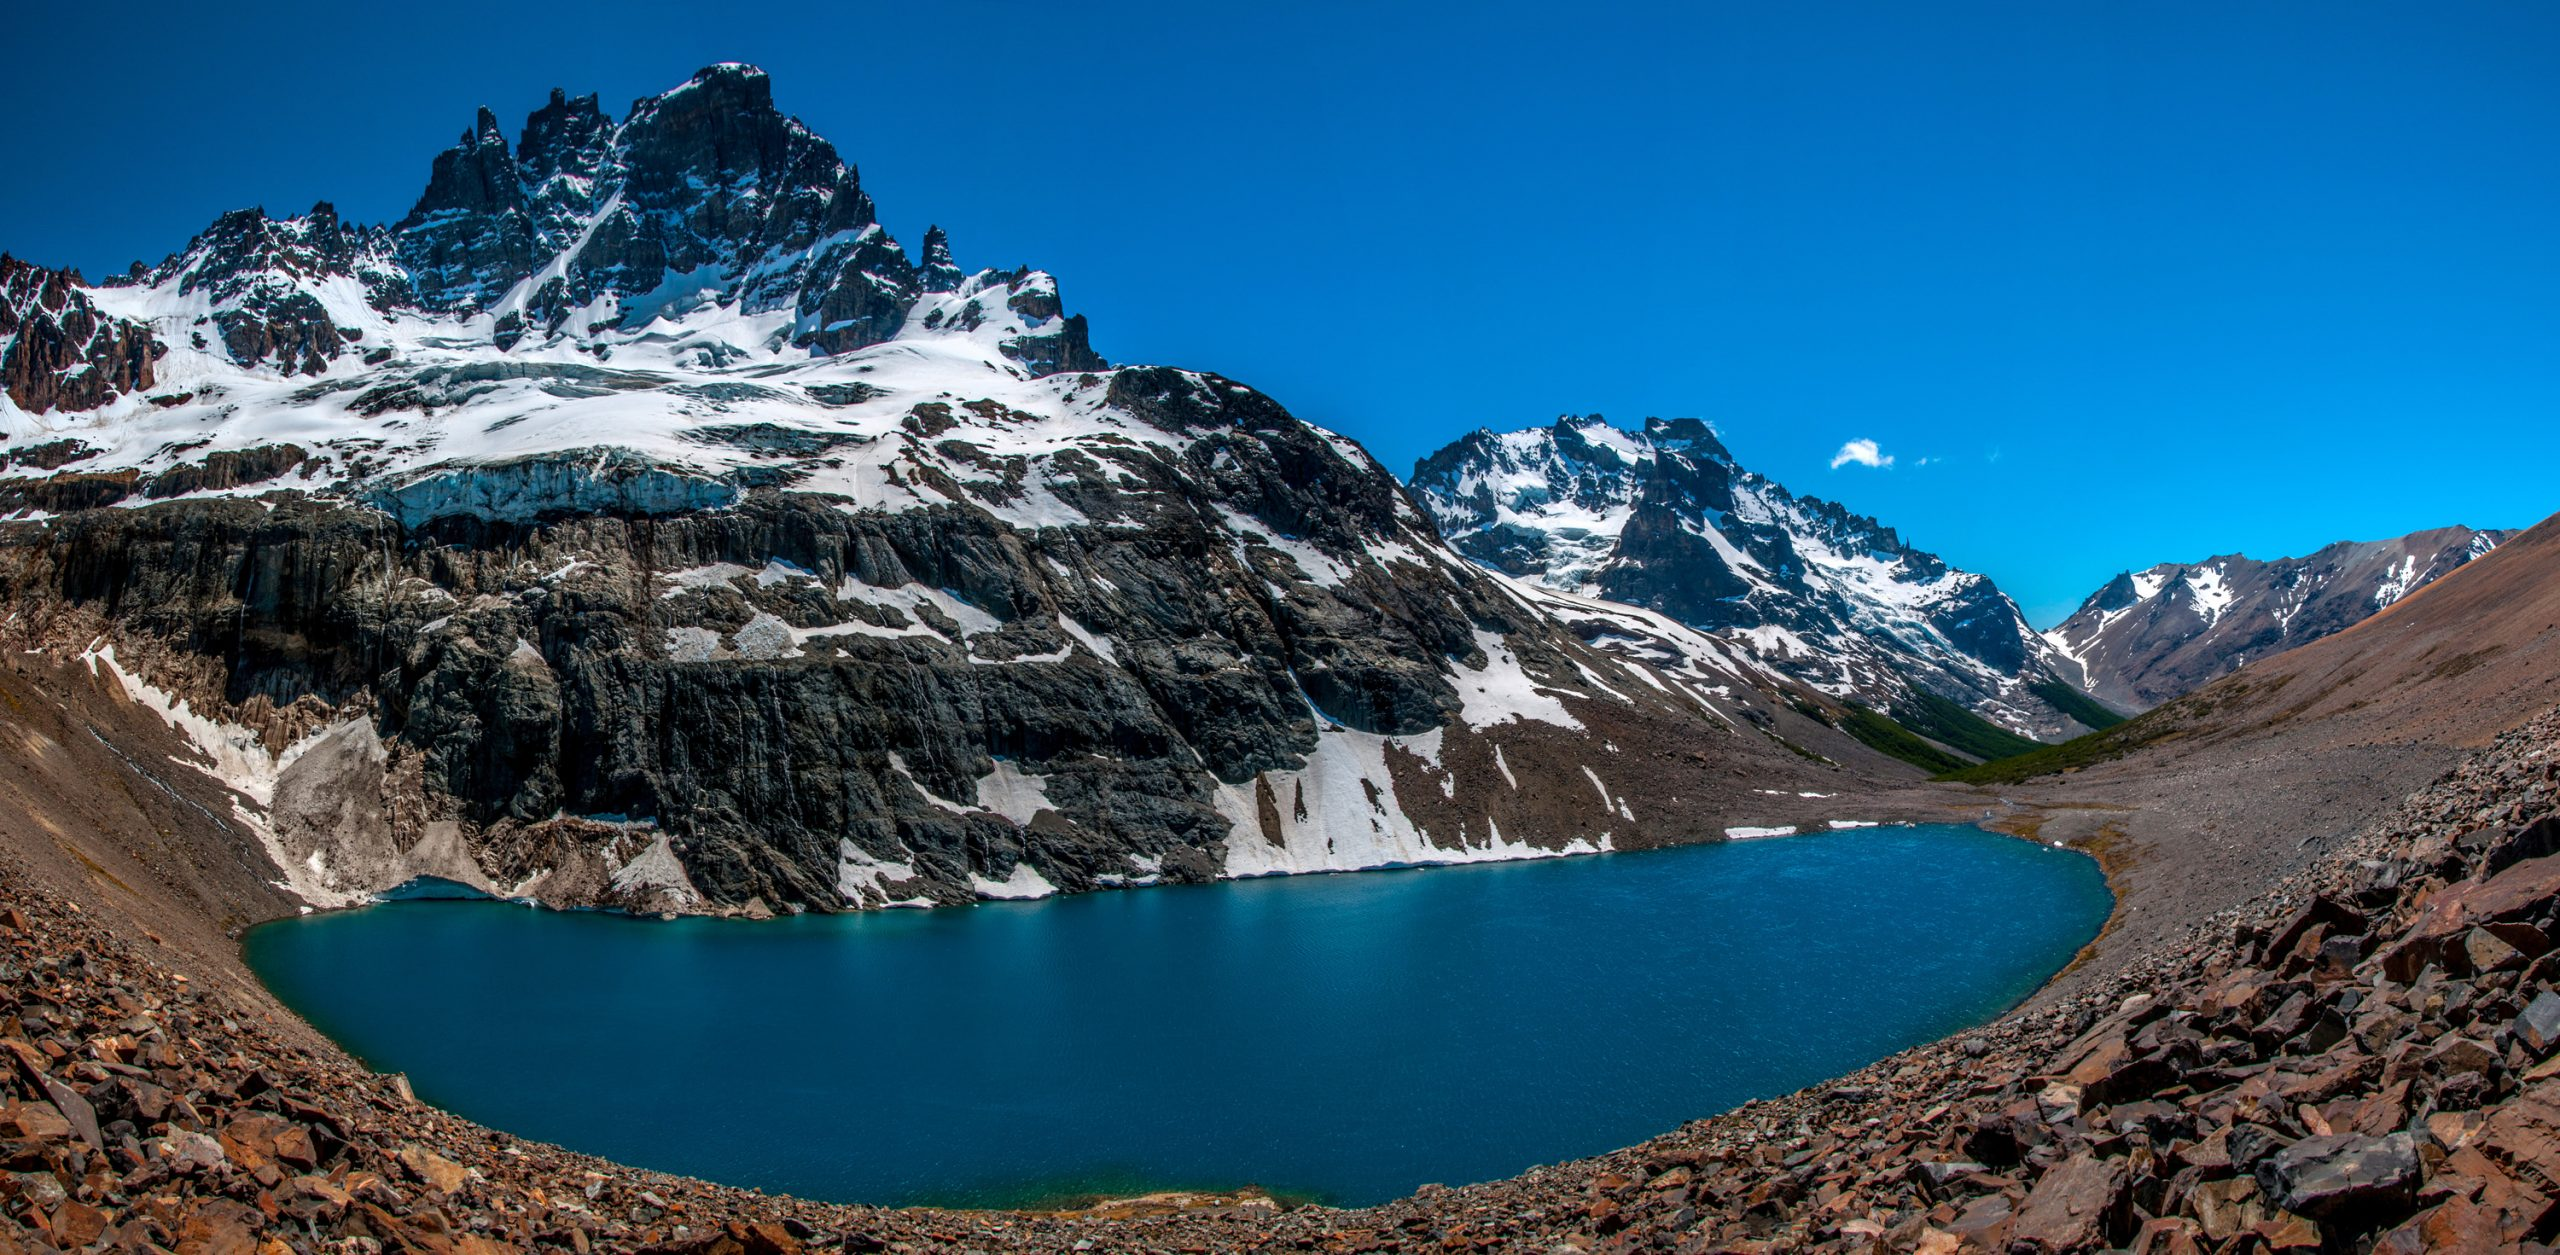 Laguna Verde hike in Cerro Castillo National Park, Chile